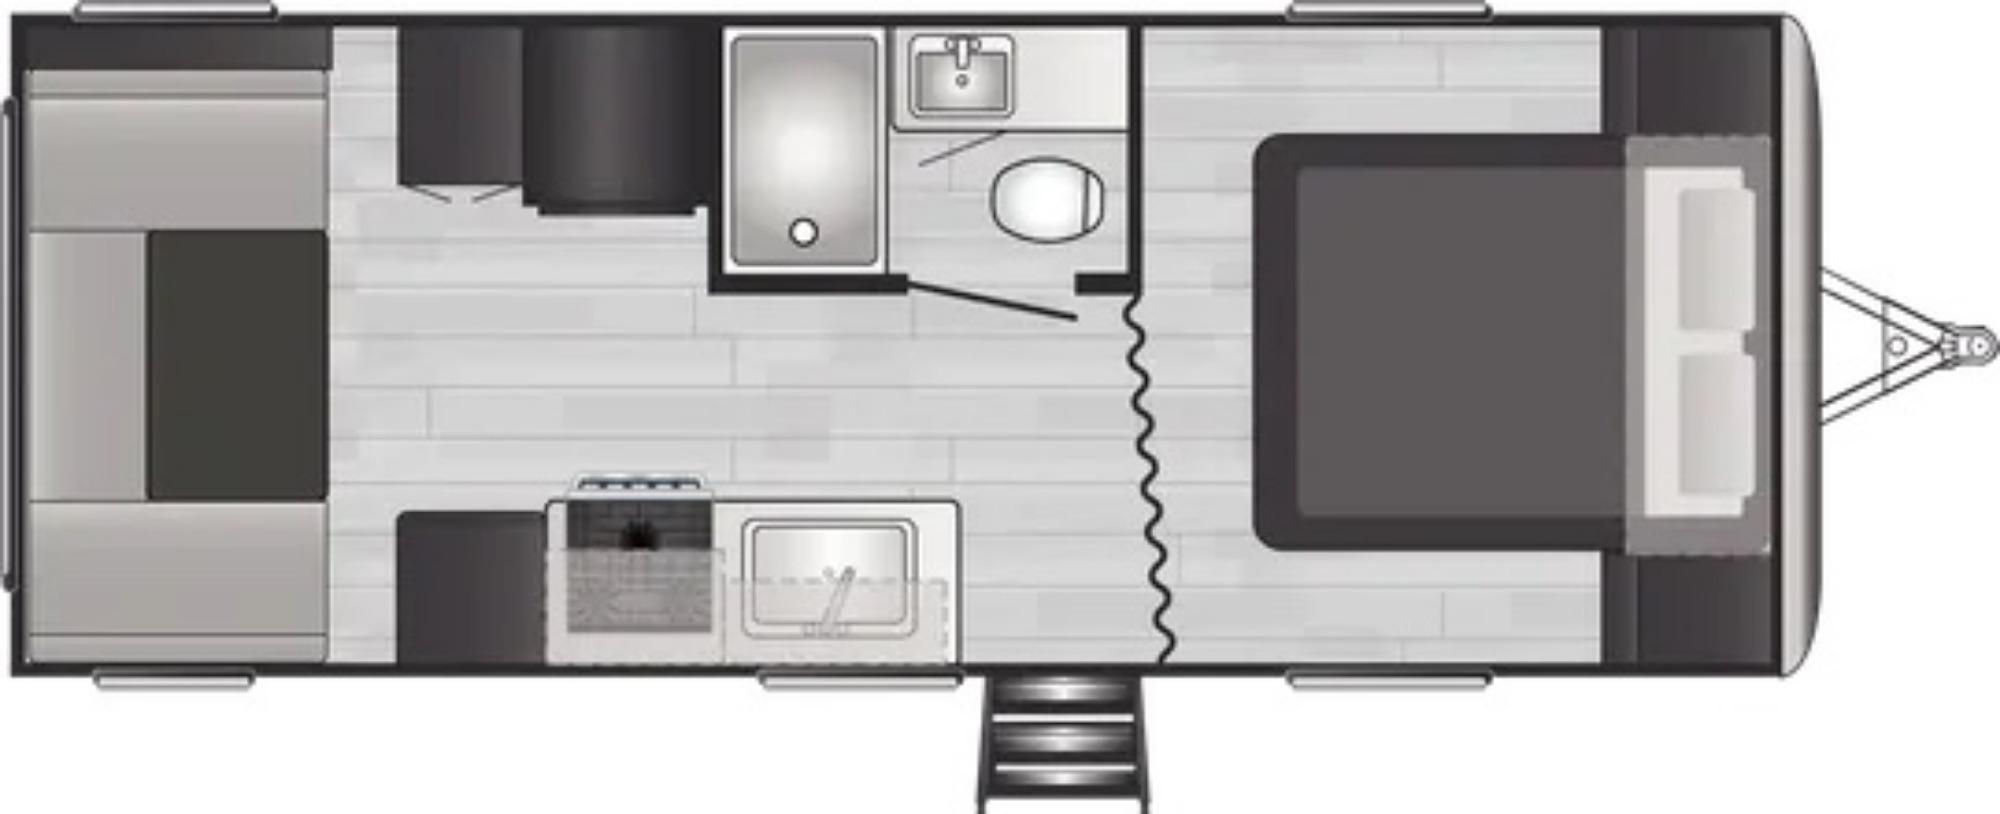 View Floor Plan for 2022 KEYSTONE SPRINGDALE 202QBWE